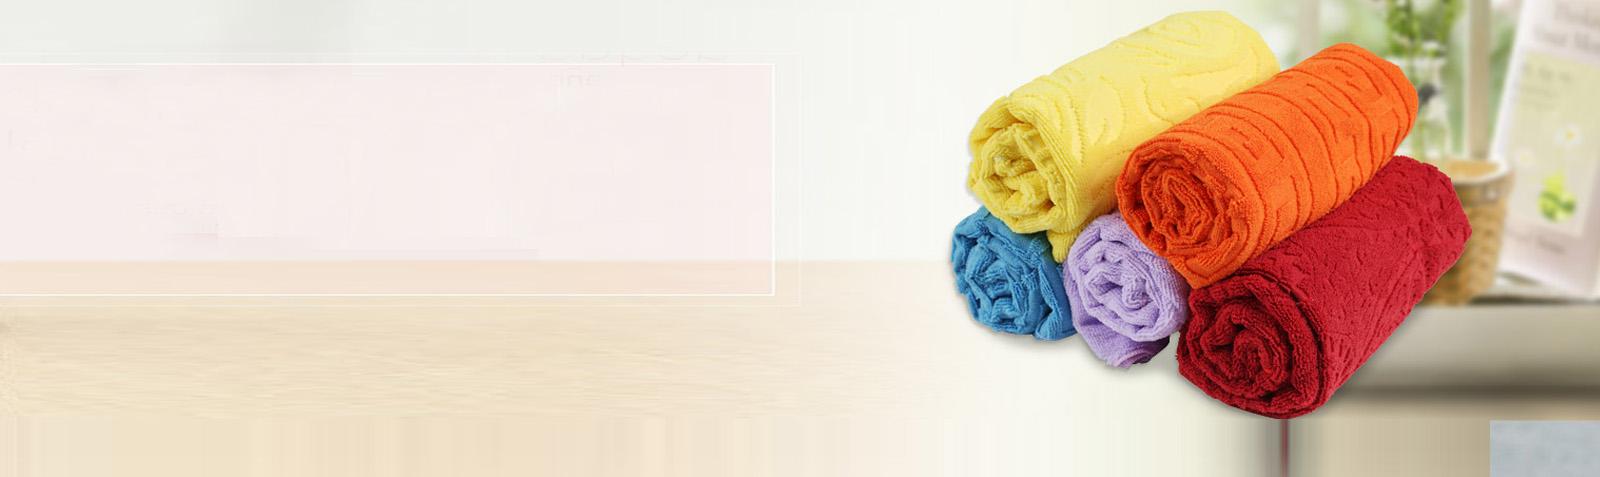 towel manufacturing usa